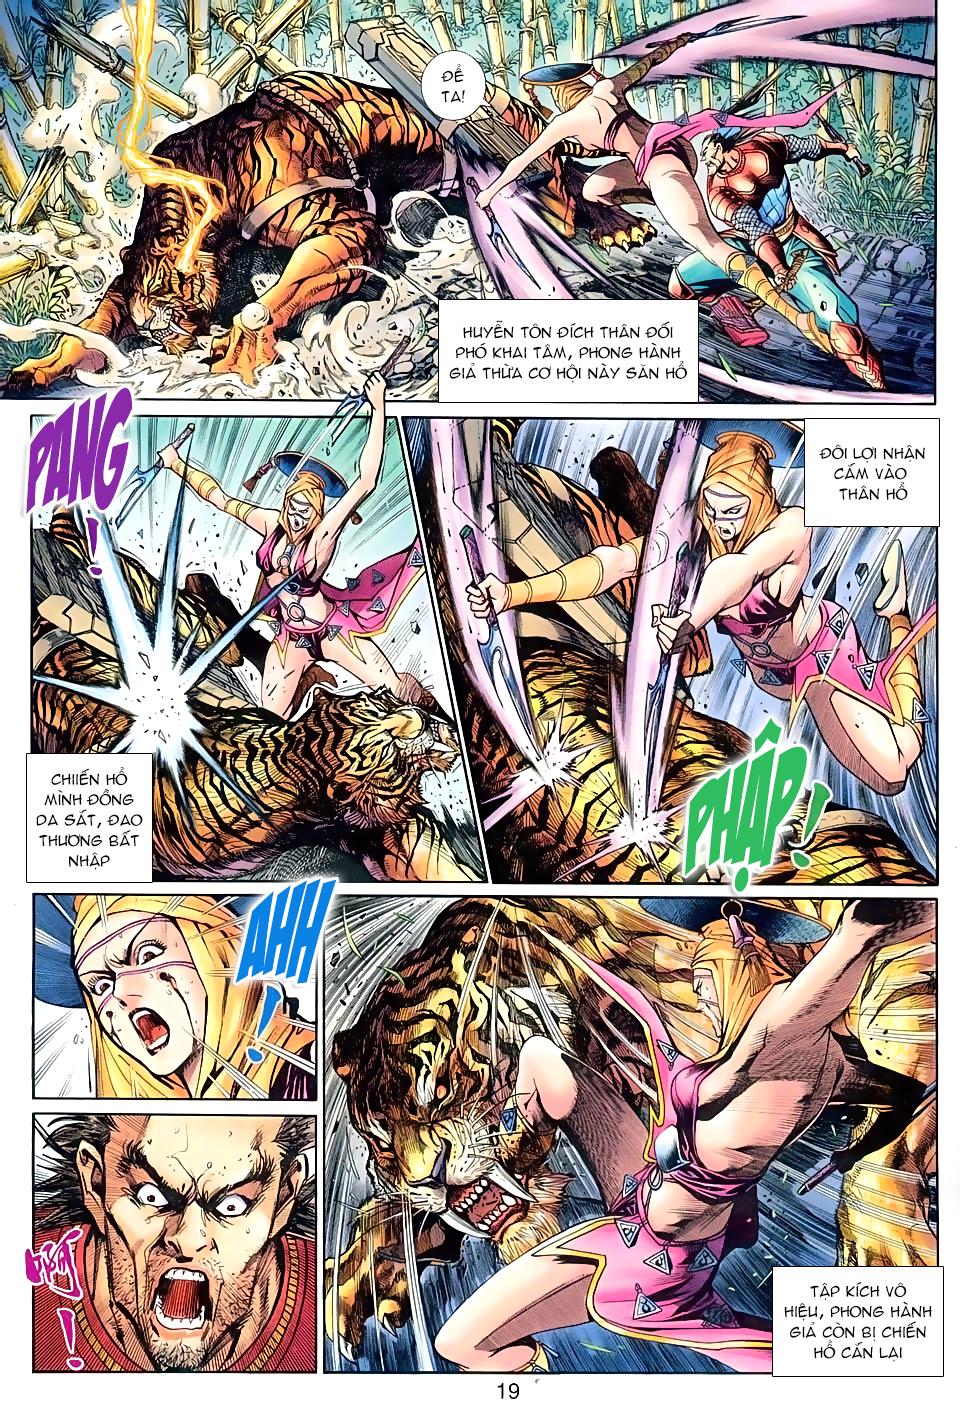 Thần binh huyền kỳ 3 - 3.5 Chapter 79 - Hamtruyen.vn